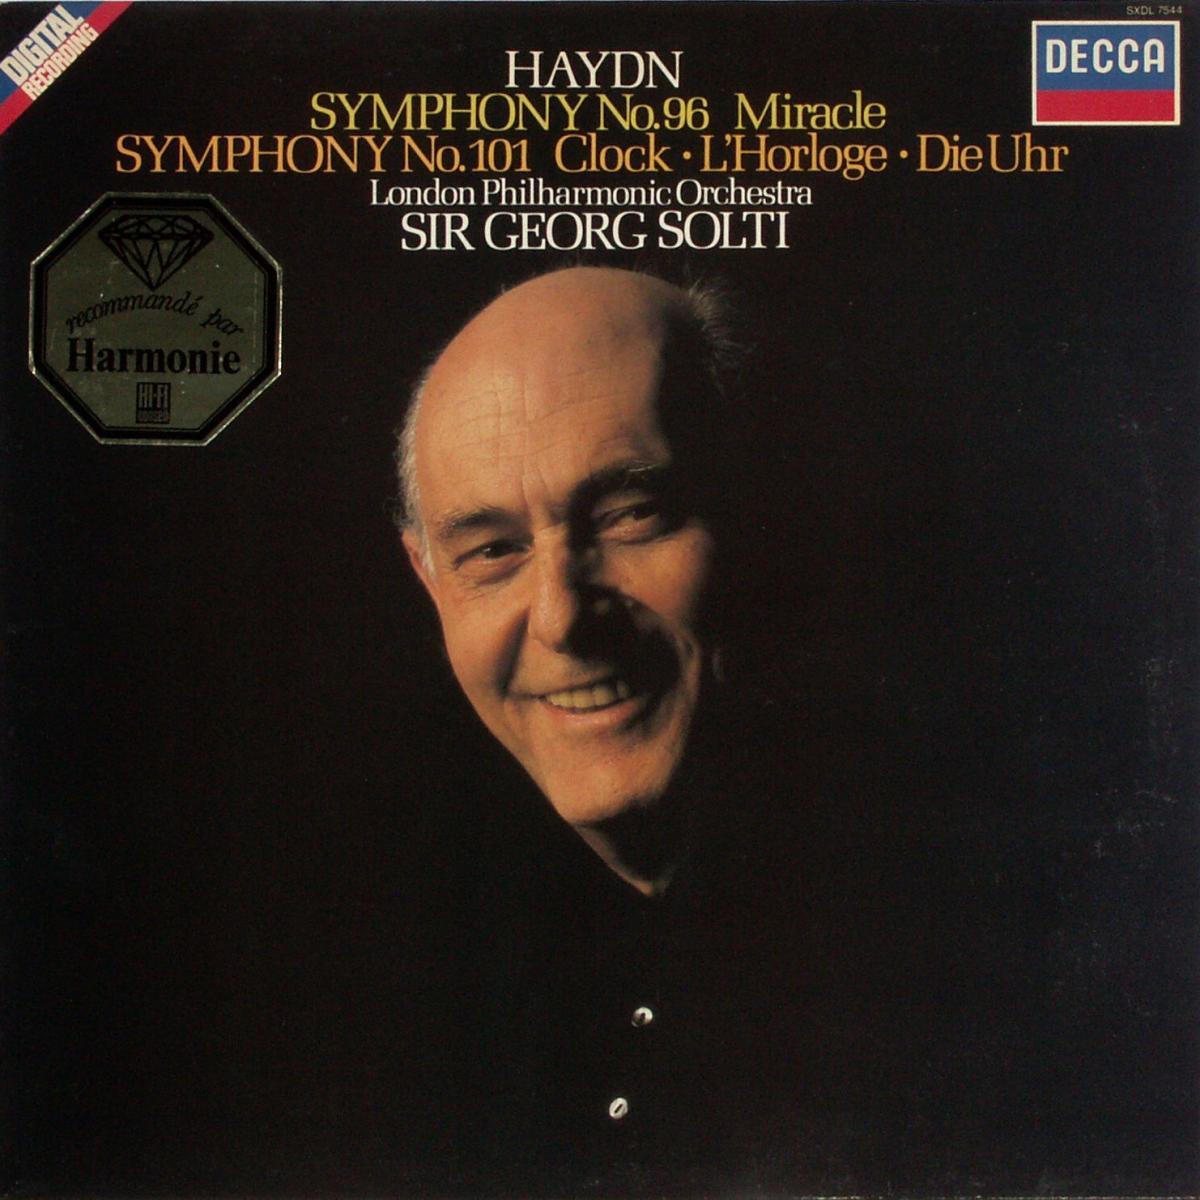 Haydn, Joseph - Symphony No. 96 & No. 101 [LP]